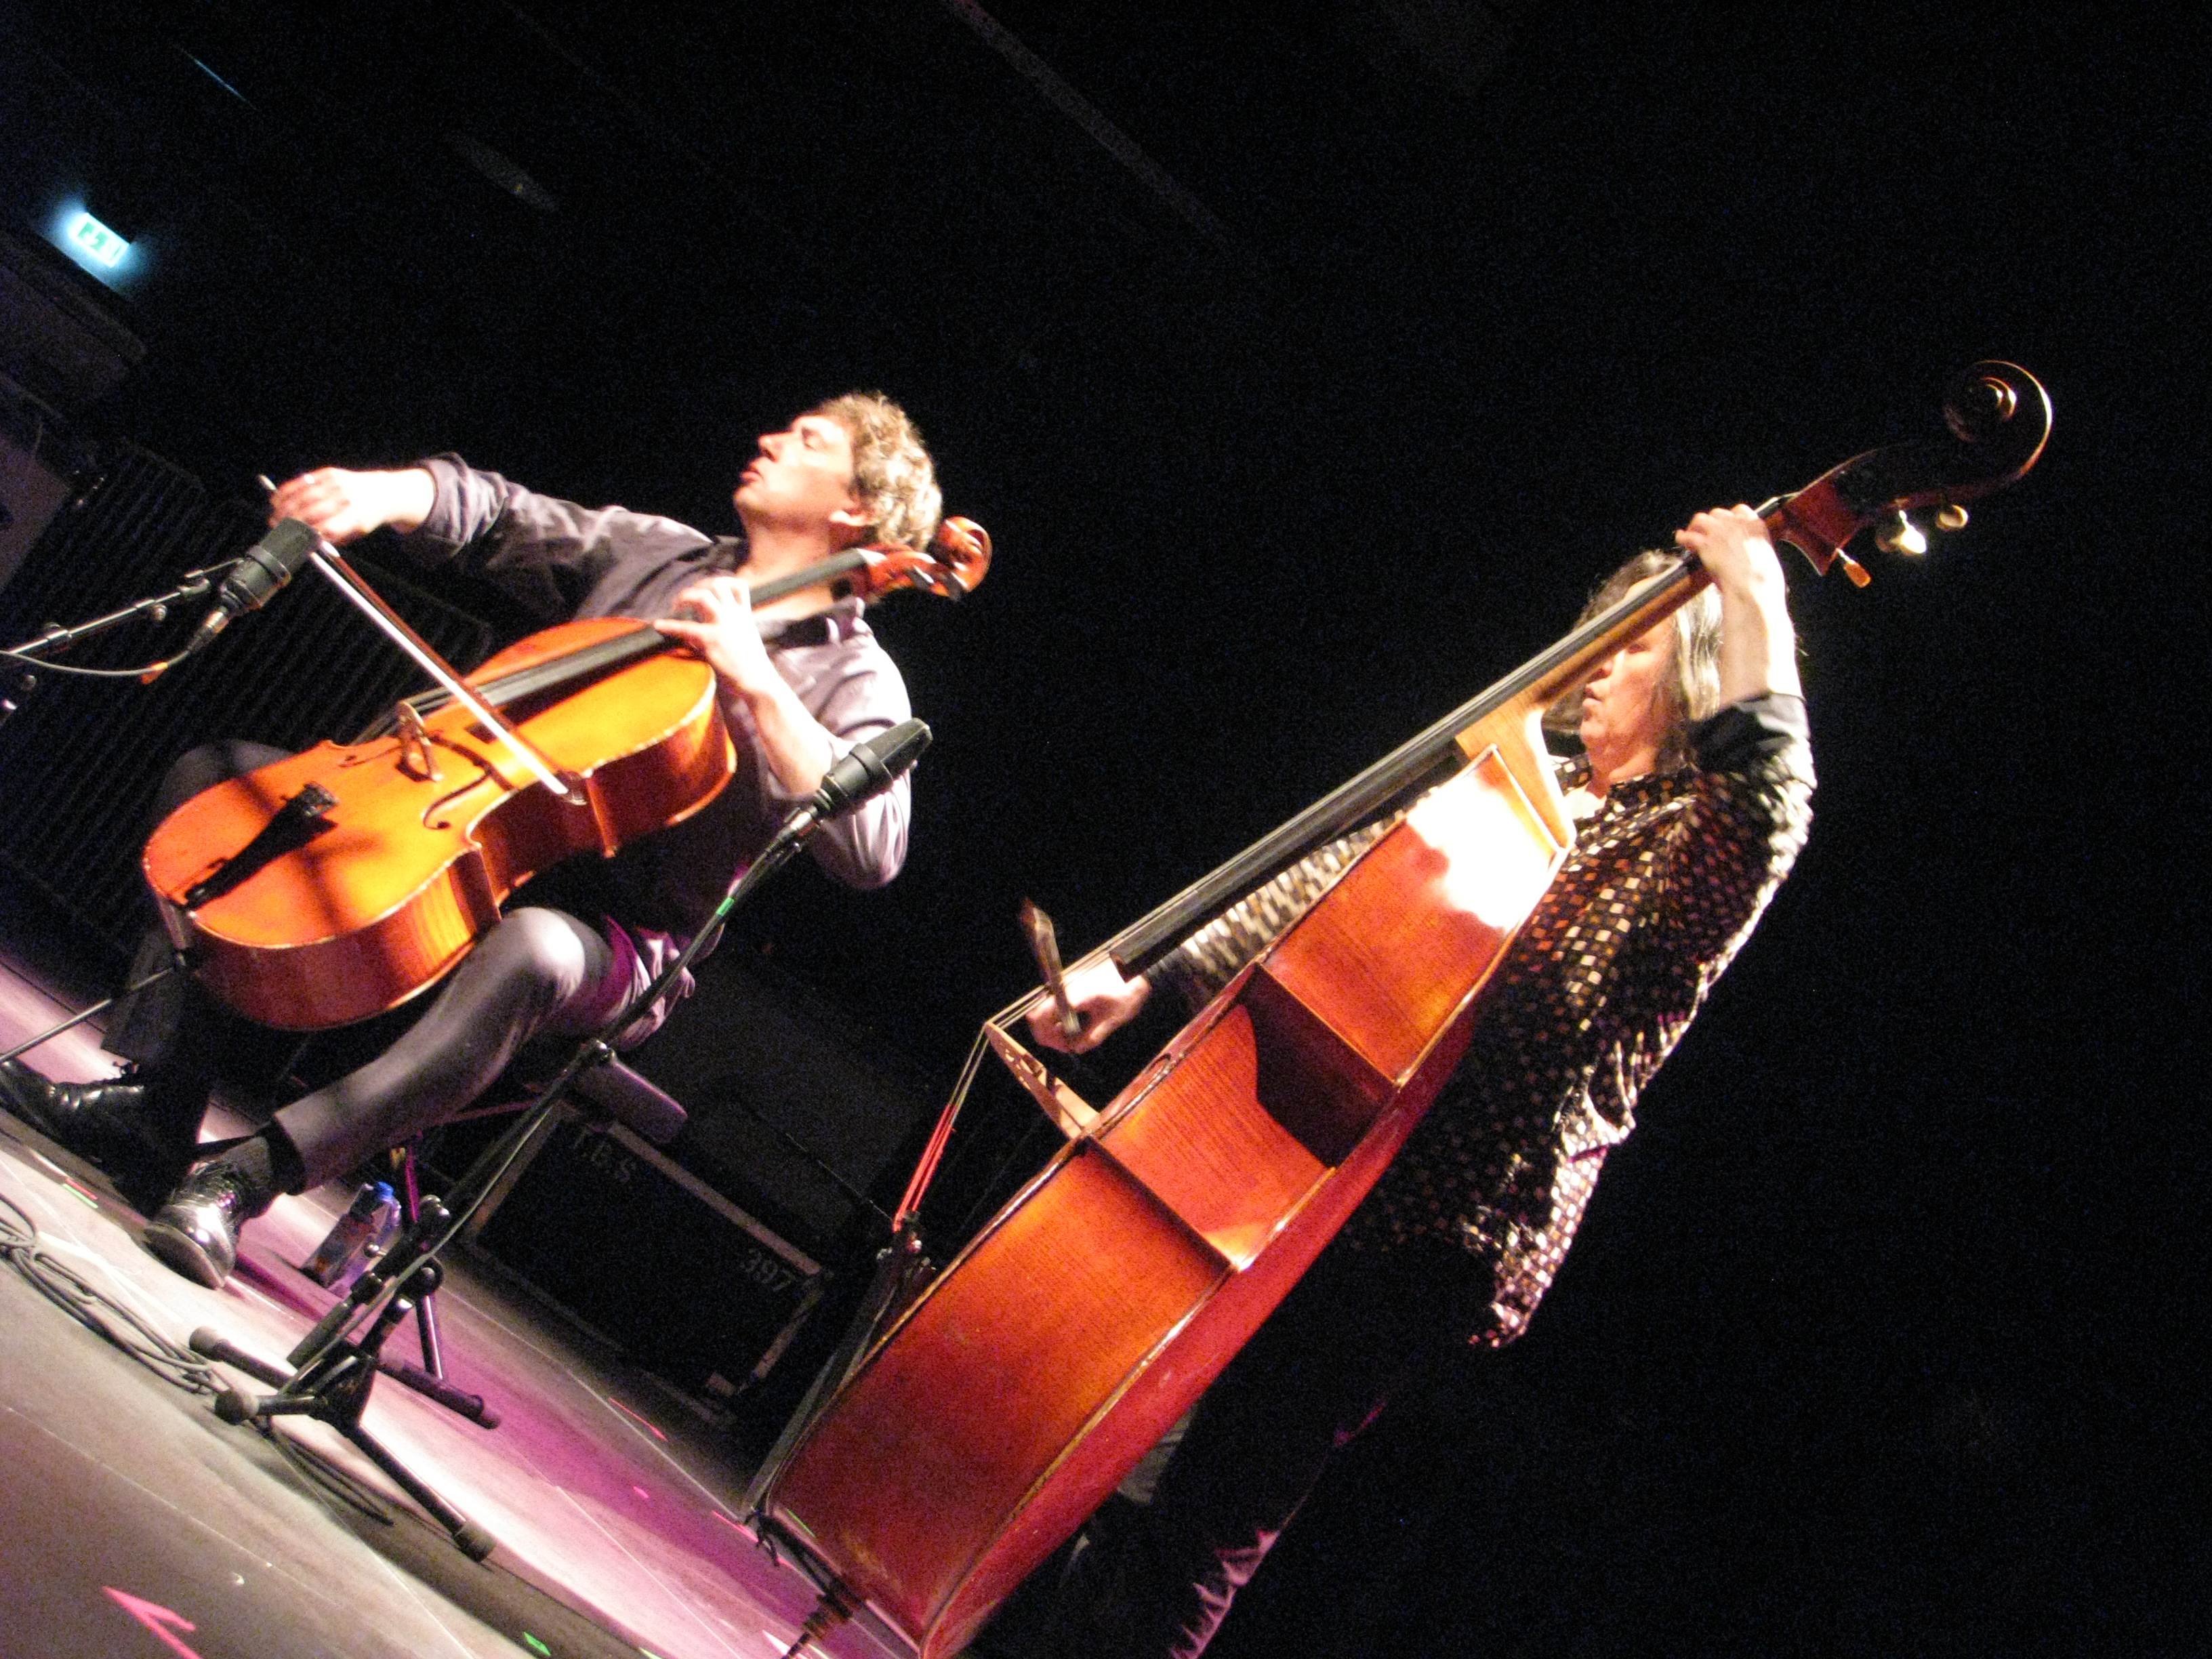 Vincent courtois + joelle léandre jazzdor berlin 2013